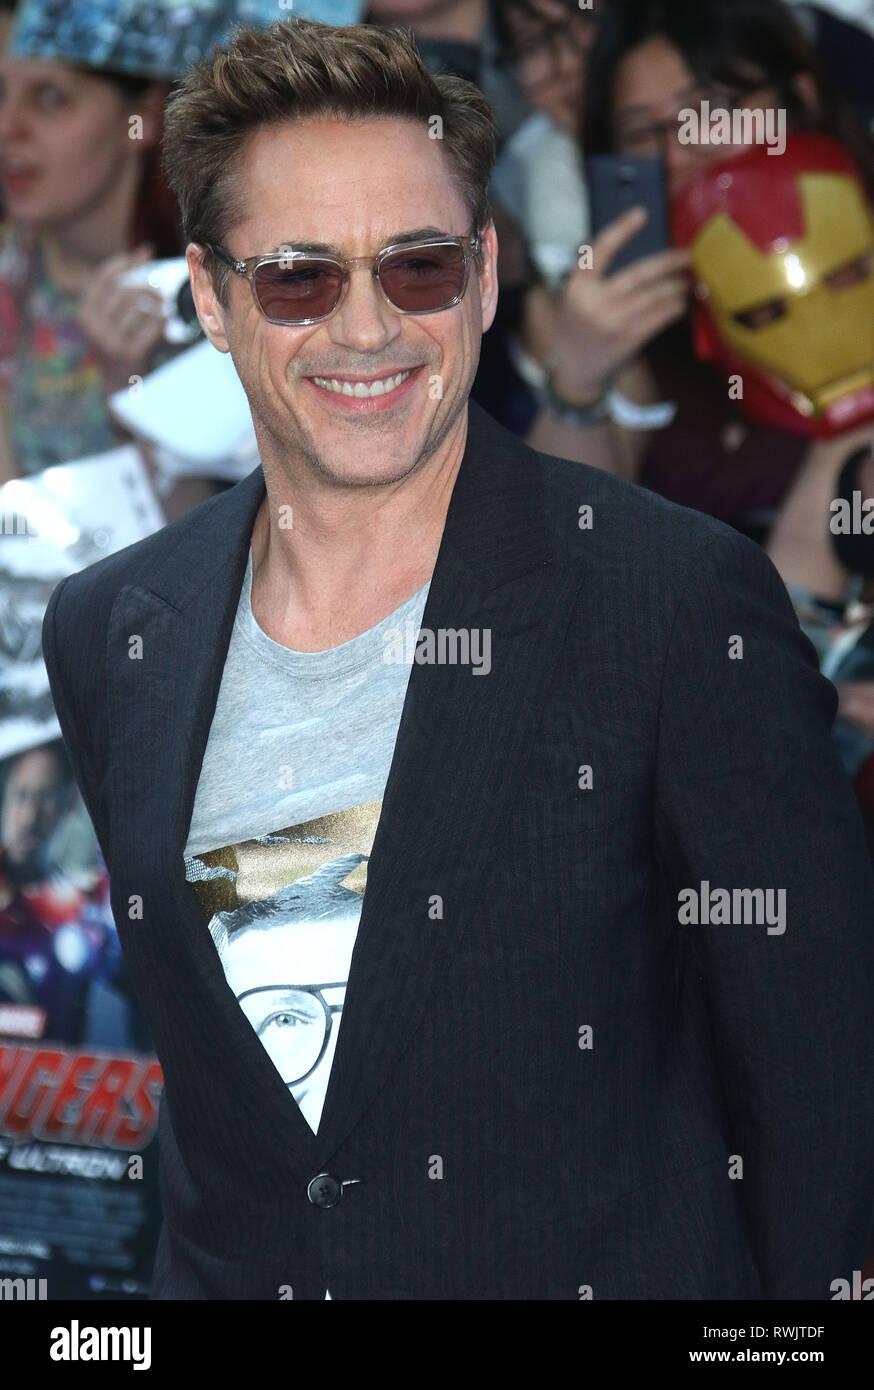 Apr 21, 2015 - London, England, UK - The Avengers: Age Of Ultron European Premiere, Vue Cinema, Westfield - Red Carpet Arrivals Photo Shows: Robert Do Stock Photo